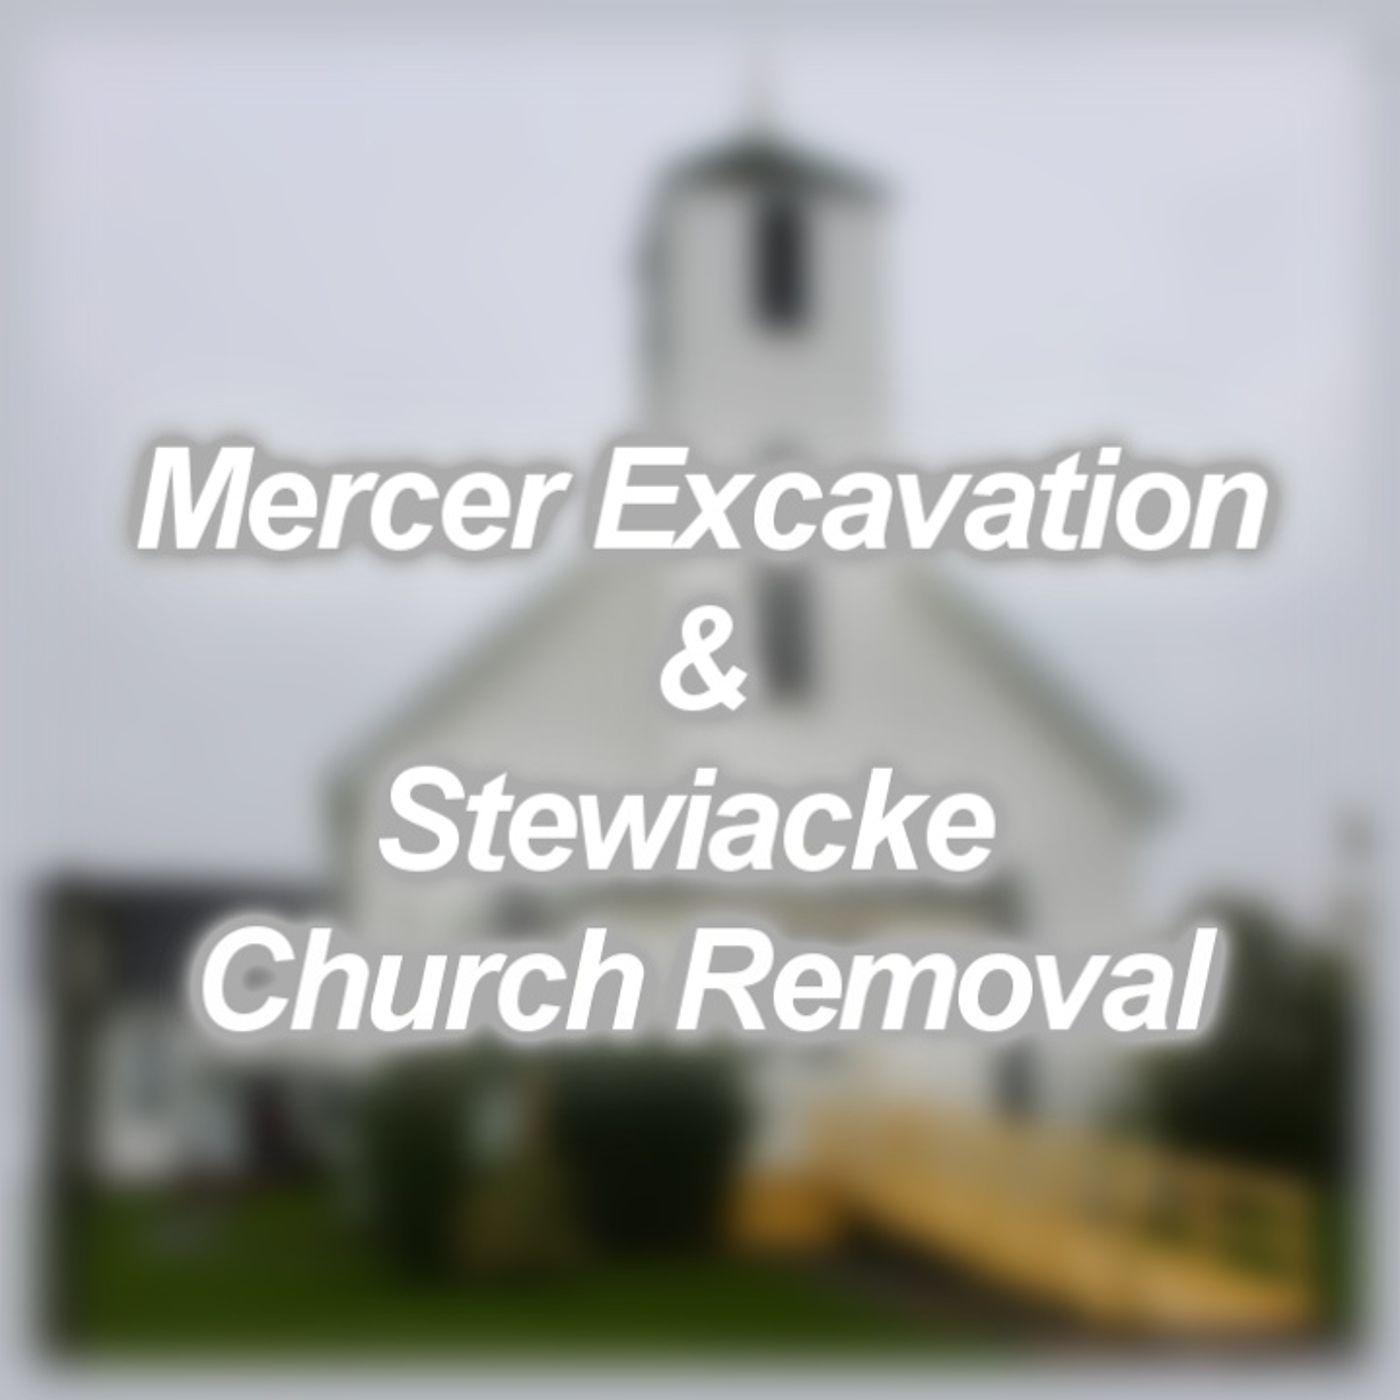 Justin Mercer - Stewiacke Church Removal